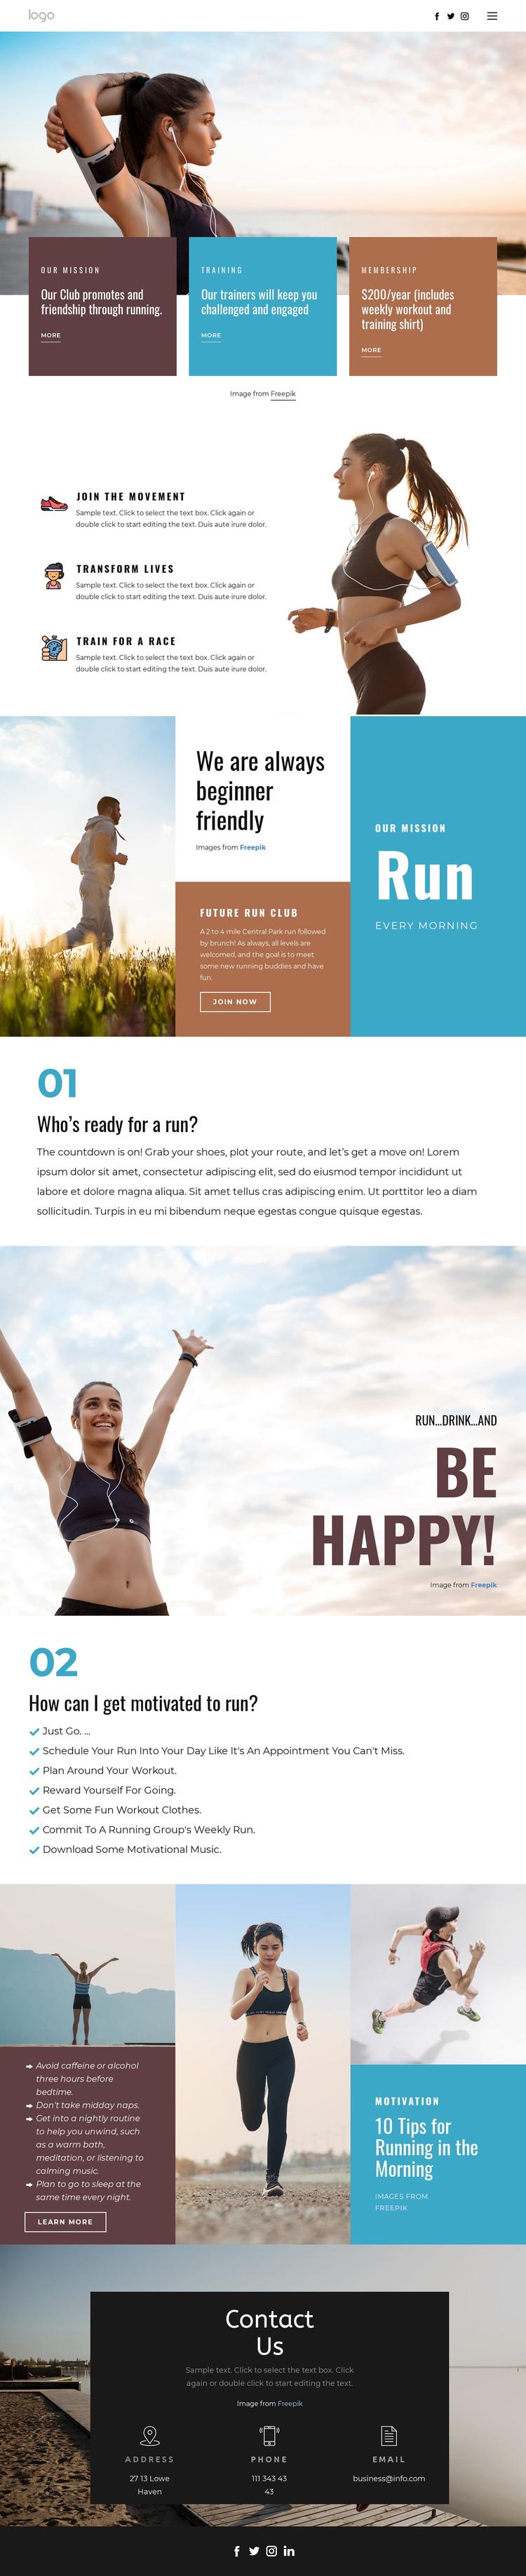 Running club for sports Website Builder Software